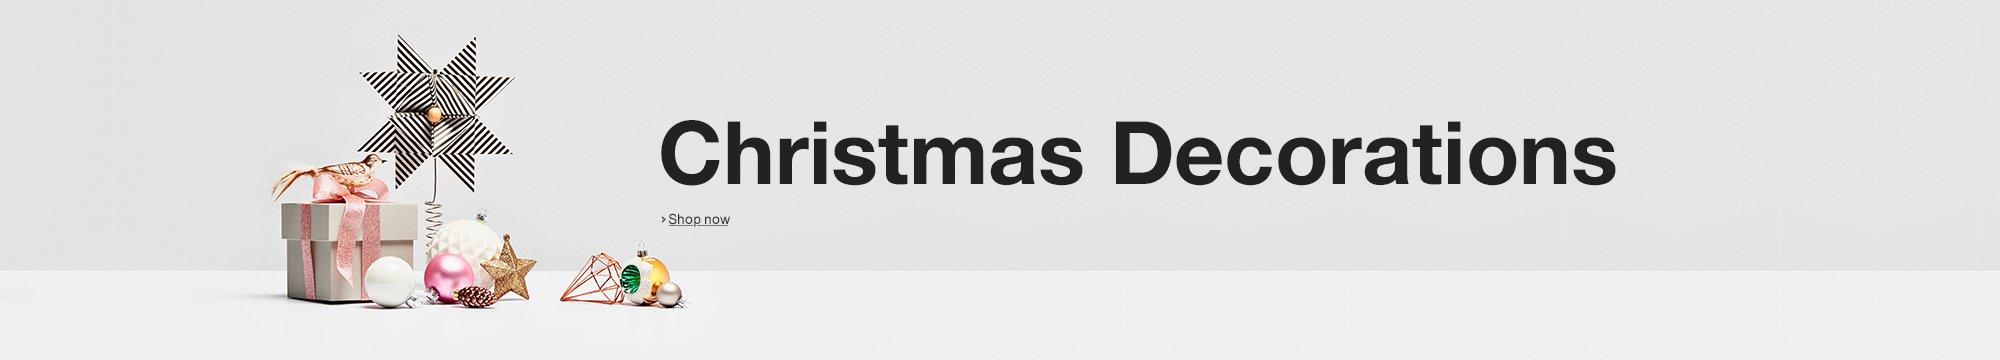 /Christmas Decorations